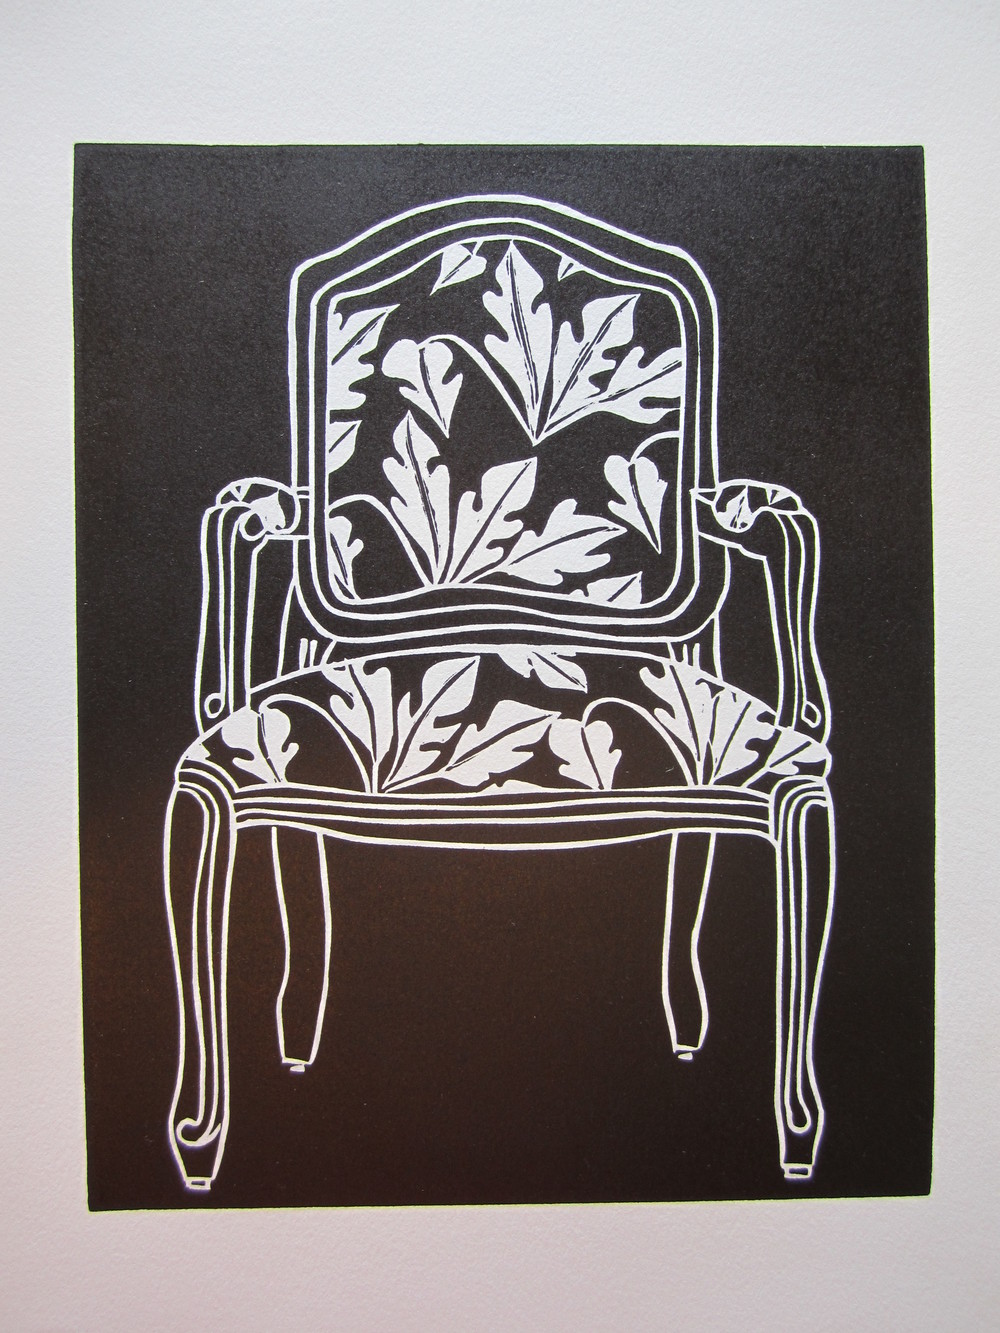 Greenbank Linocut print - Armchair II - 8 in x 10 in.JPG